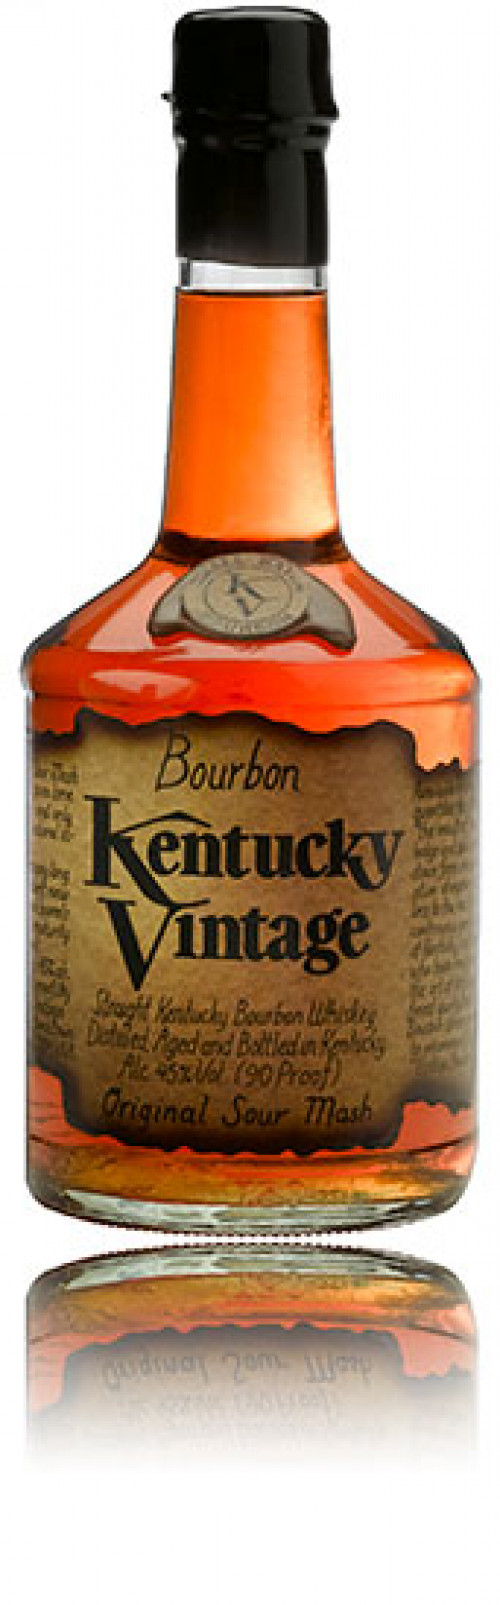 Kentucky Vintage Bourbon 750ml